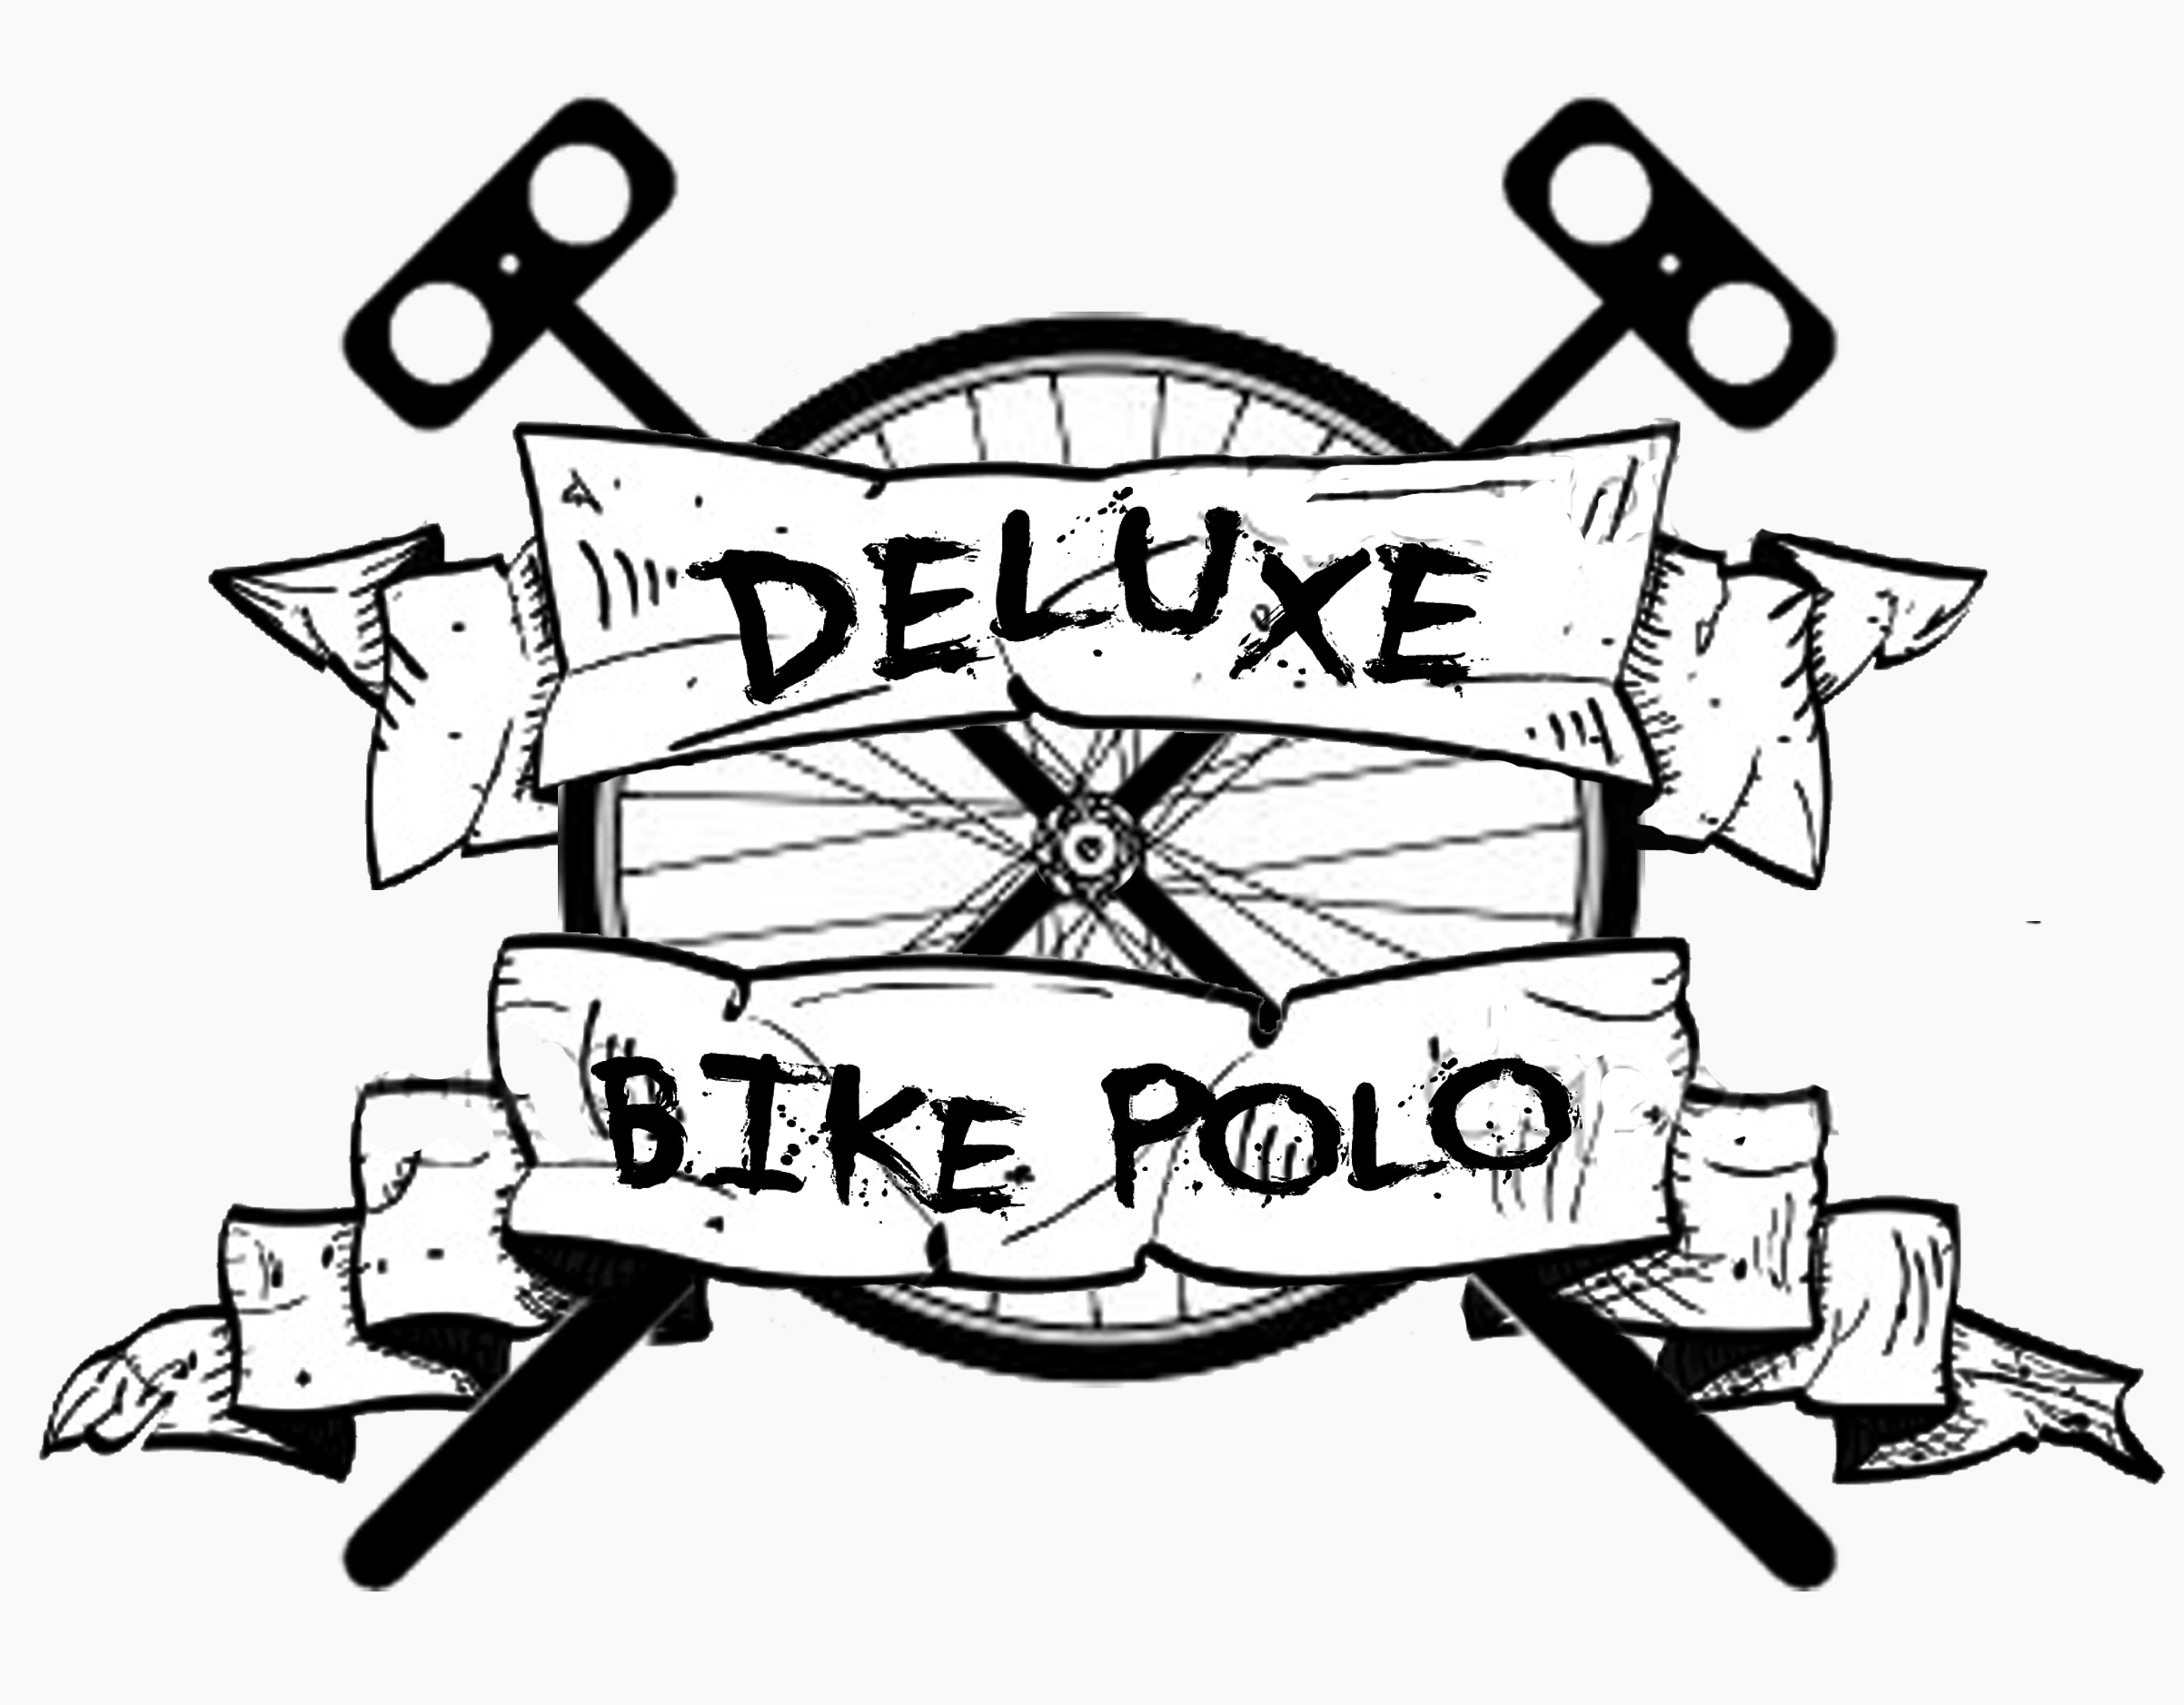 DELUXE BIKE POLO